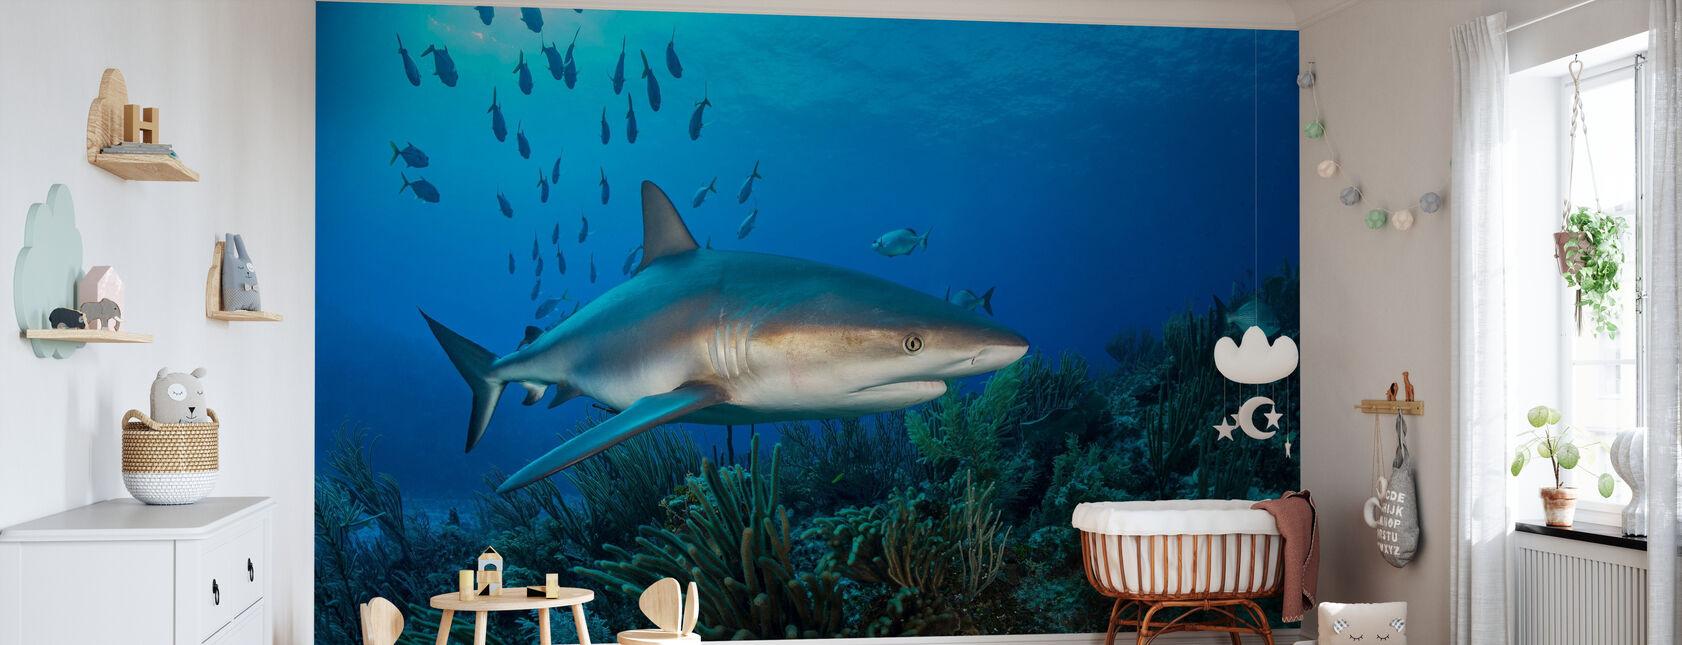 Caraïbische rif haai - Behang - Babykamer